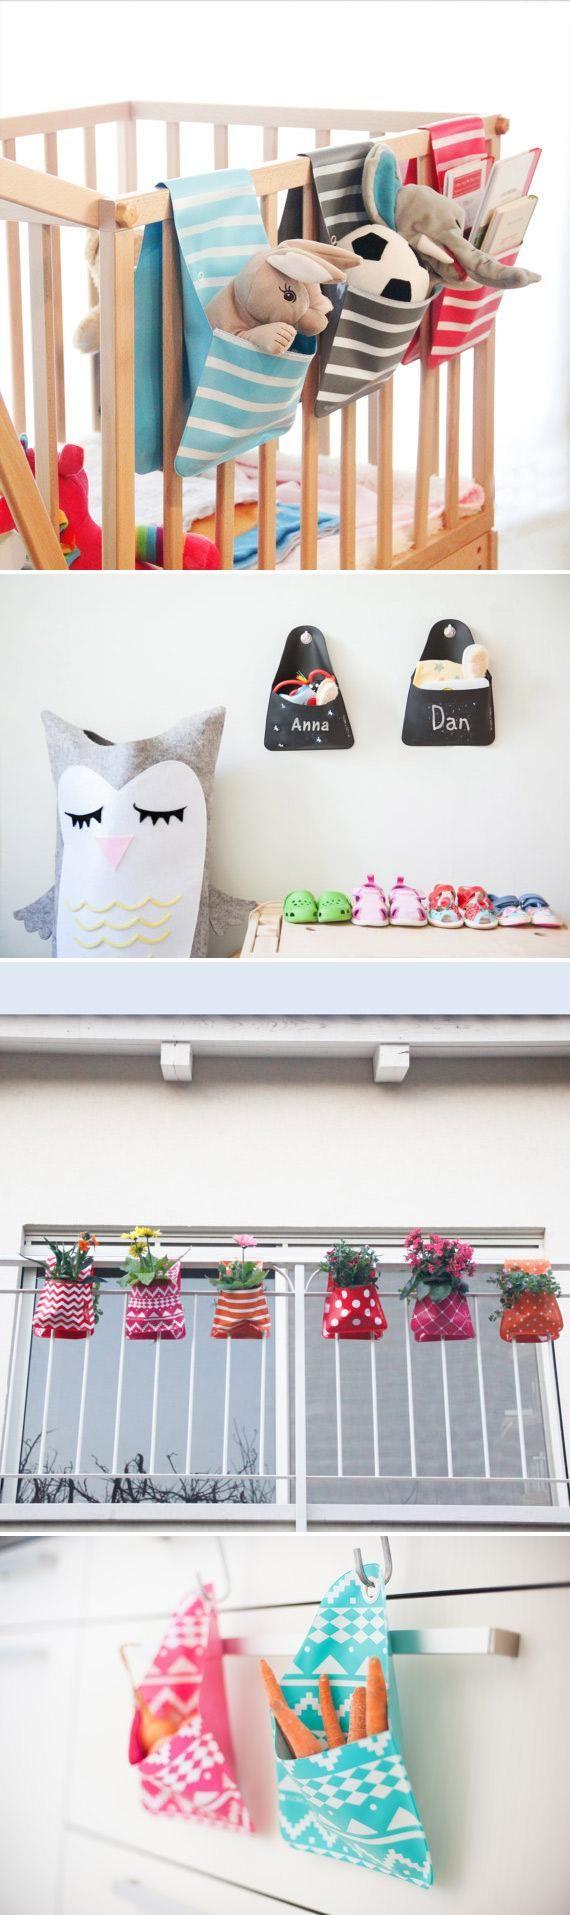 s e aufbewahrung f rs kinderbett kinderzimmerkram. Black Bedroom Furniture Sets. Home Design Ideas